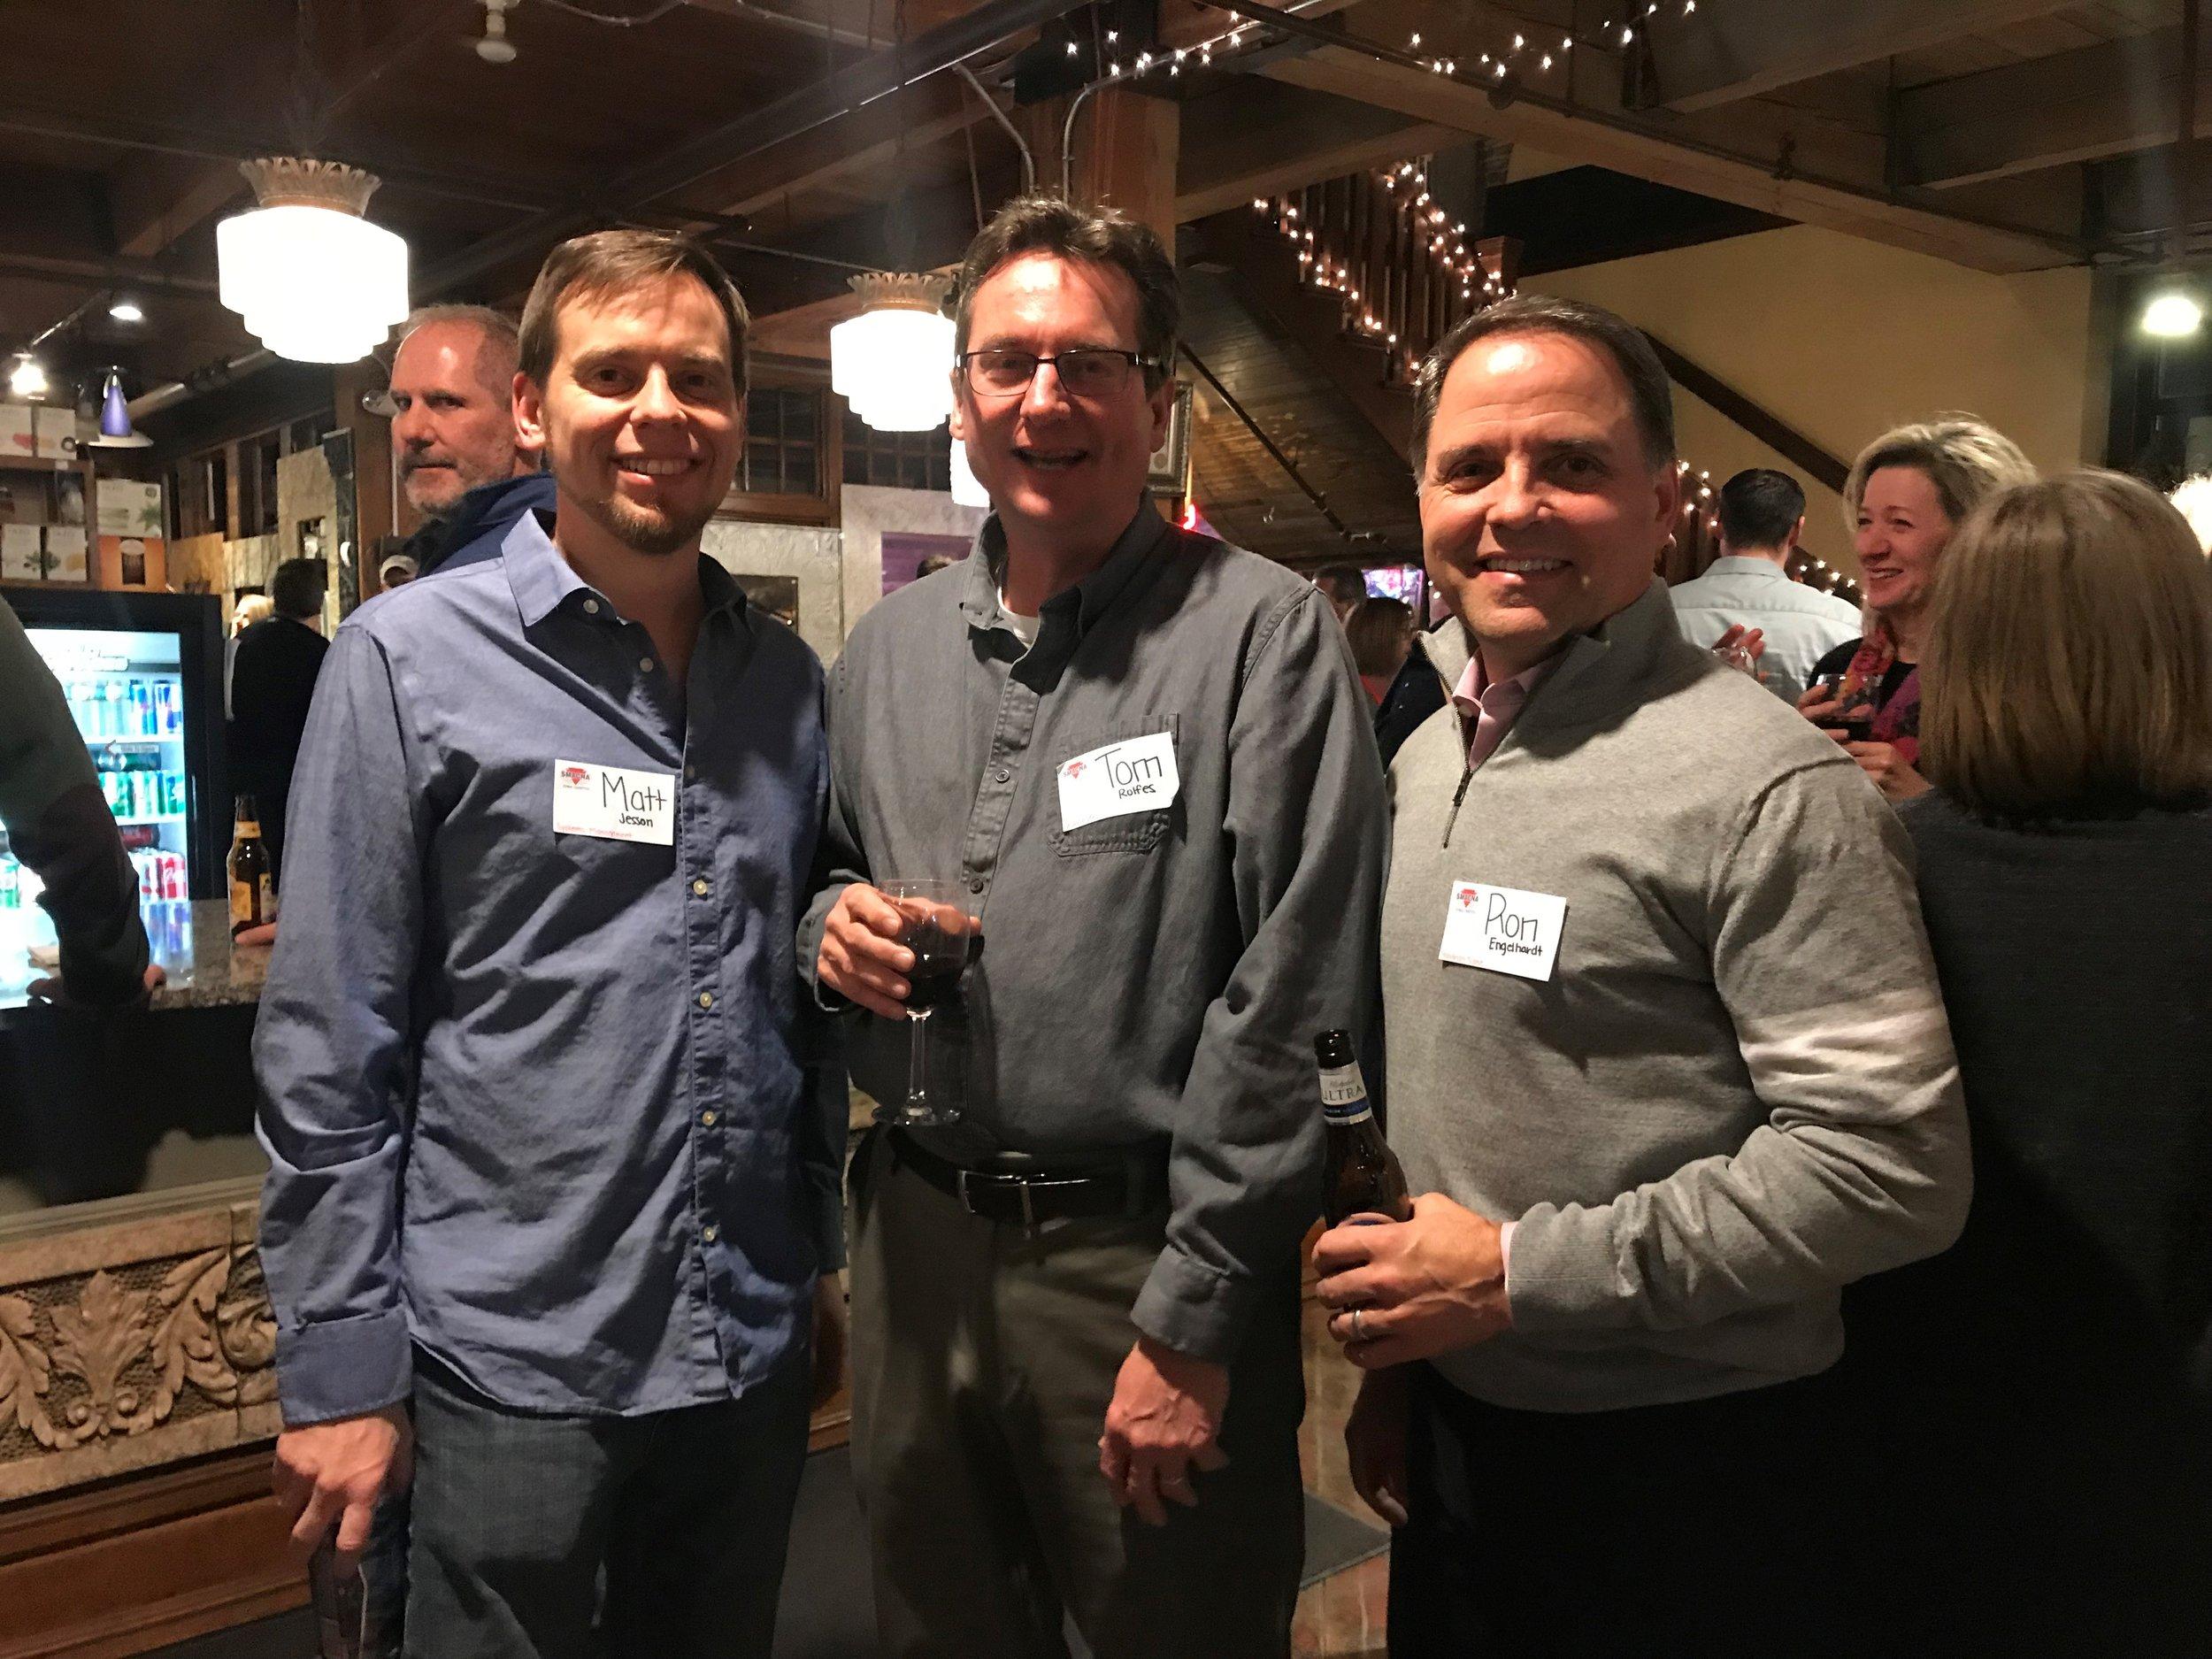 Matt Jesson, Tom Rolfes and Ron Engelhardt